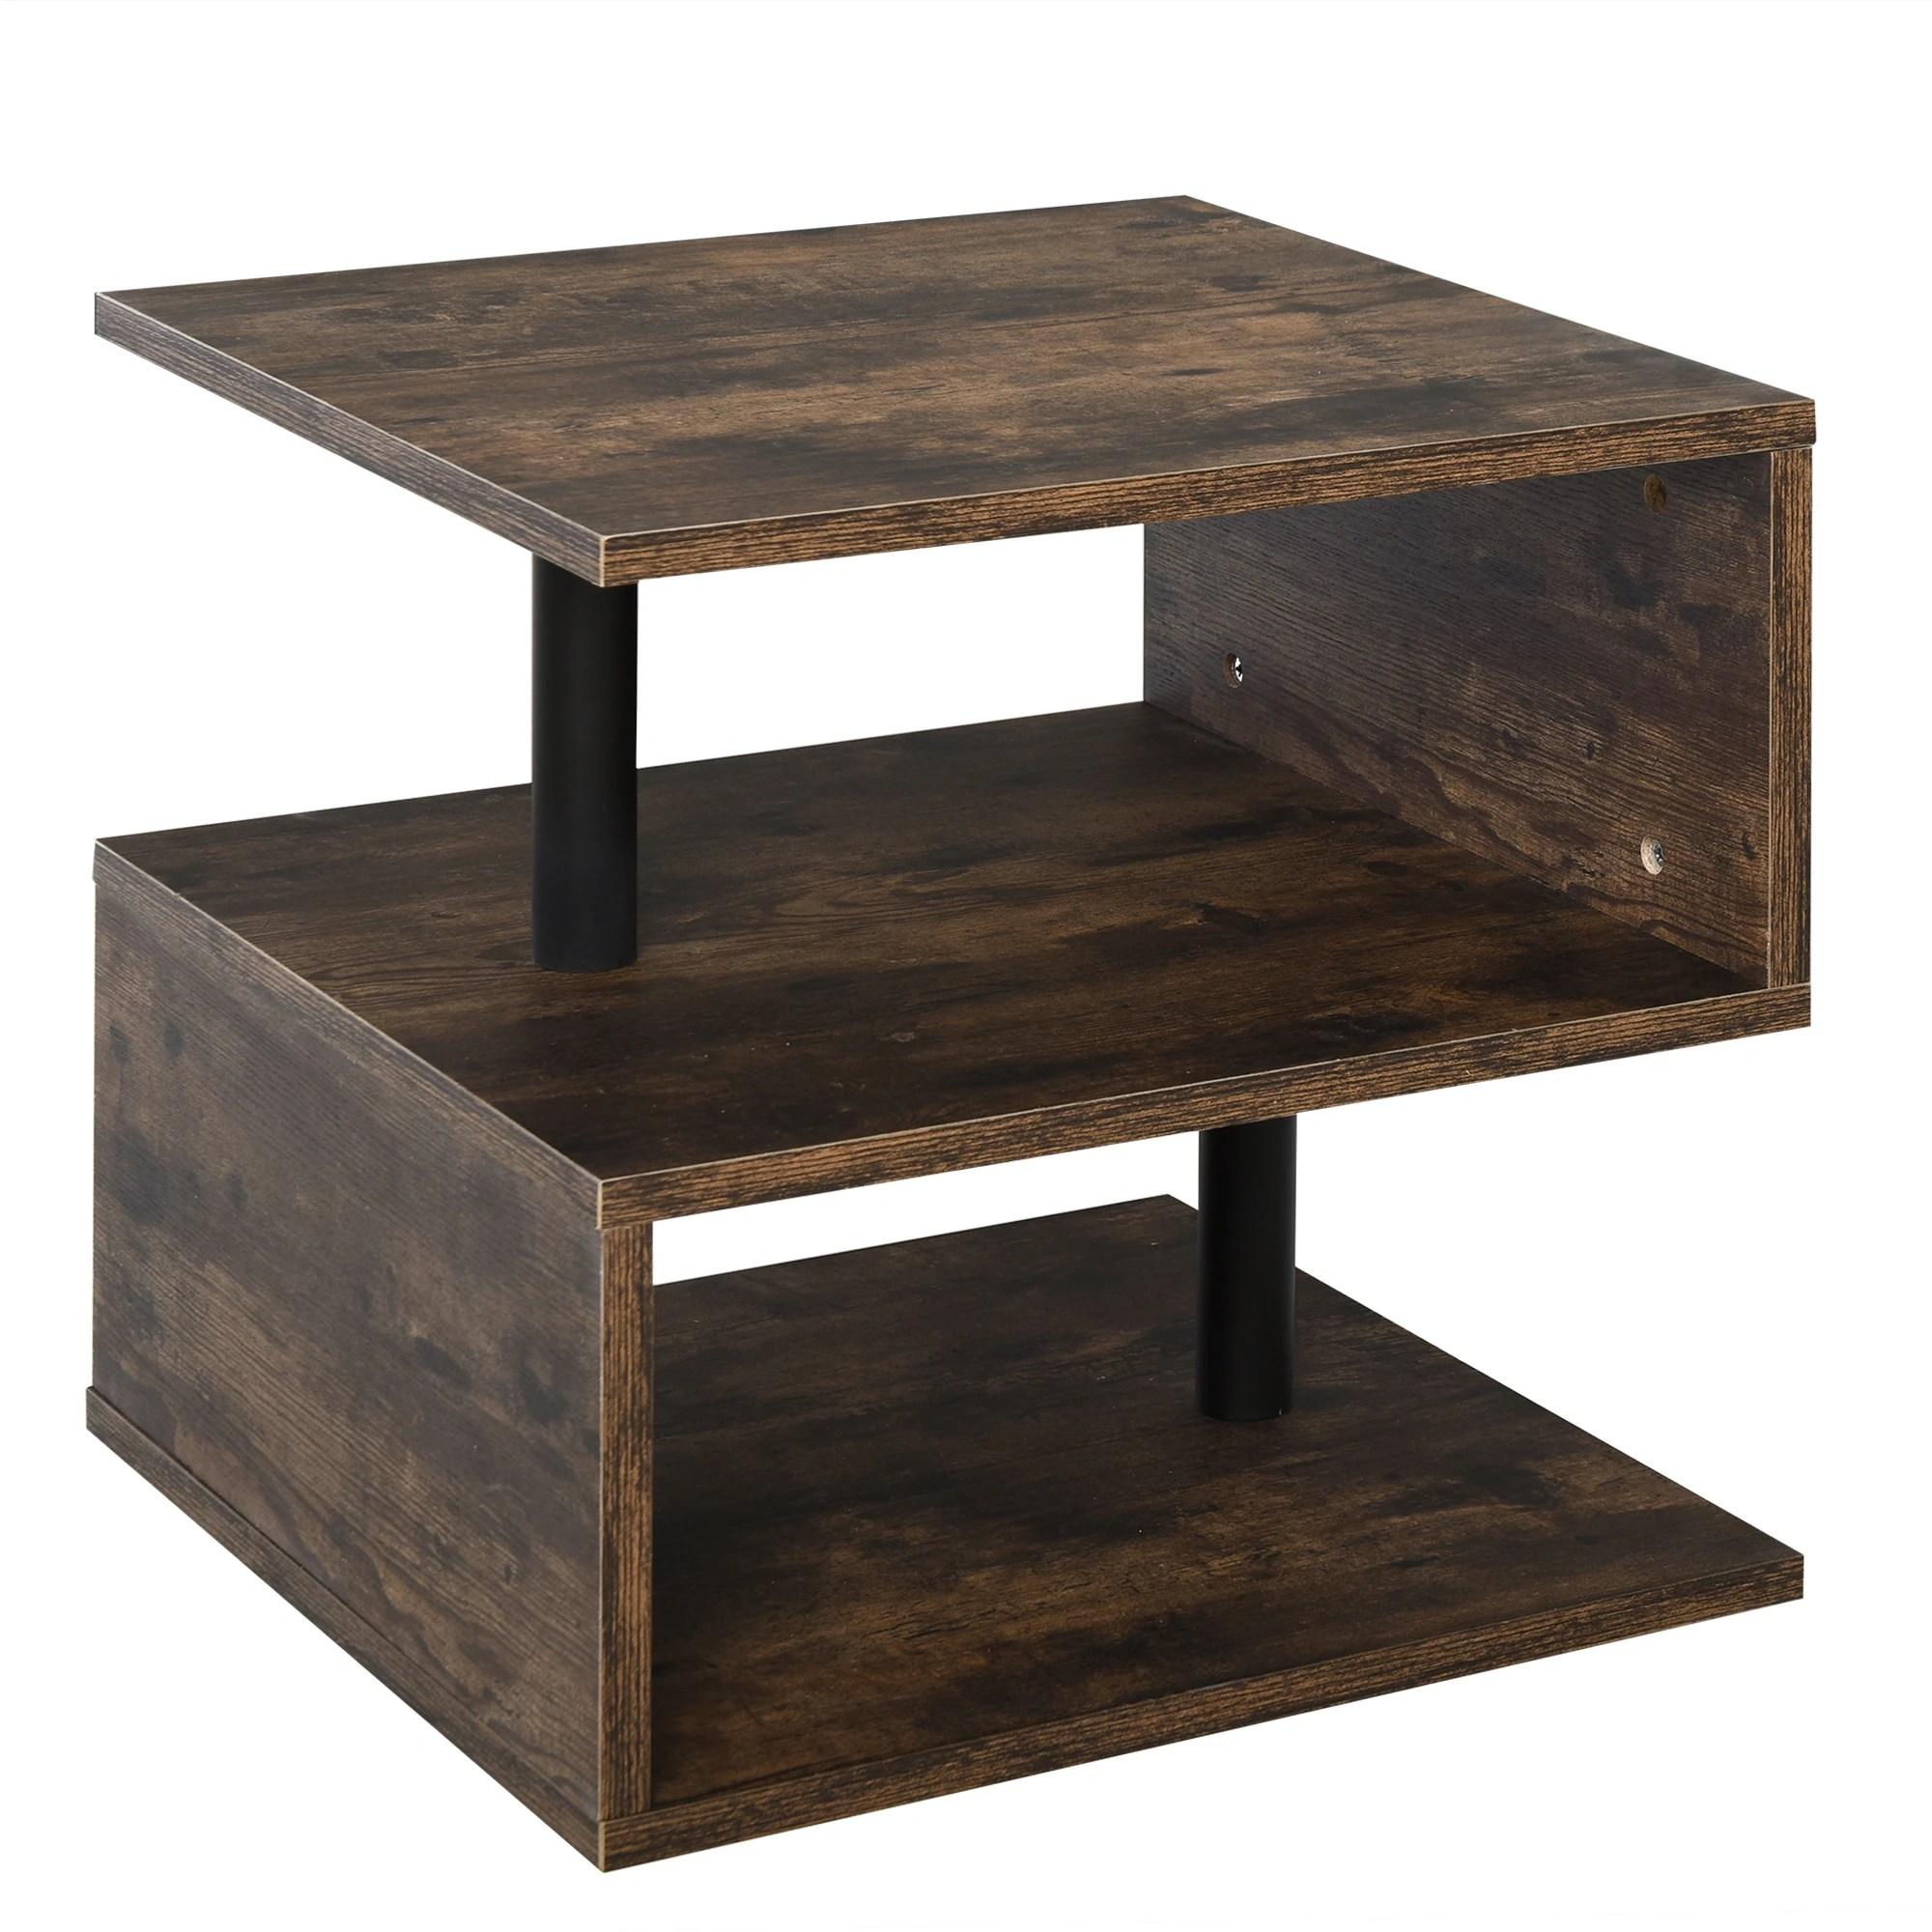 homcom industrial modern 3 tier side table or end desk with unique s shaped design 3 shelves for storage display